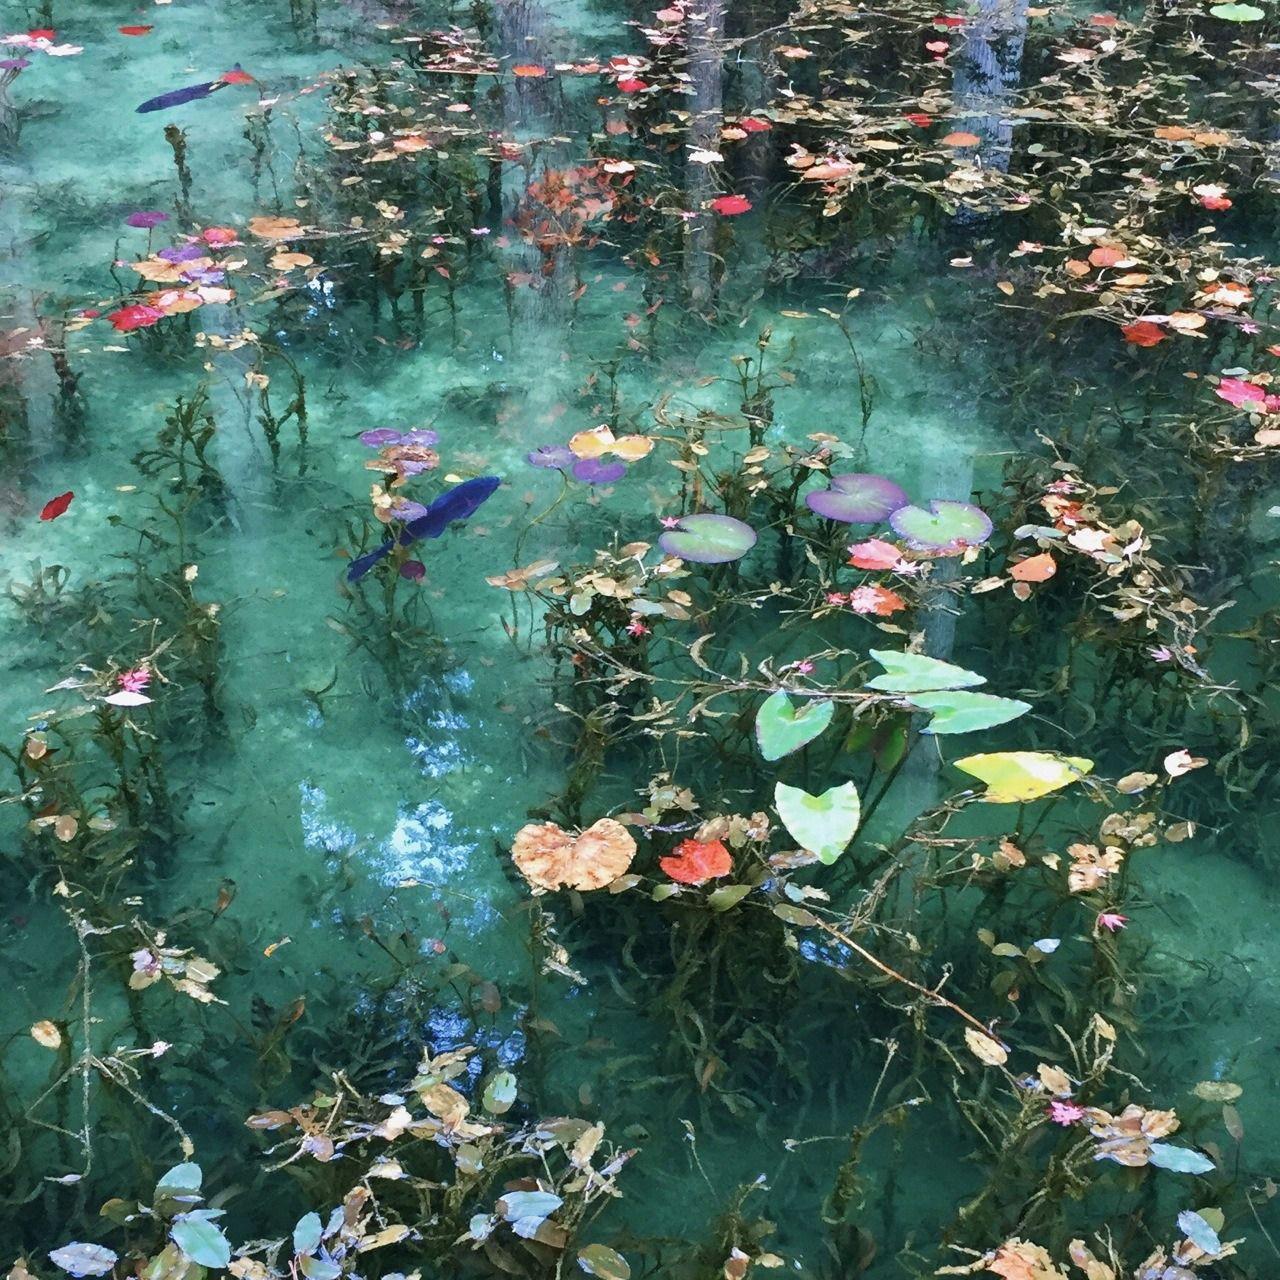 Monet s pond seki city gifu prefecture japan art for Koi pond quezon city